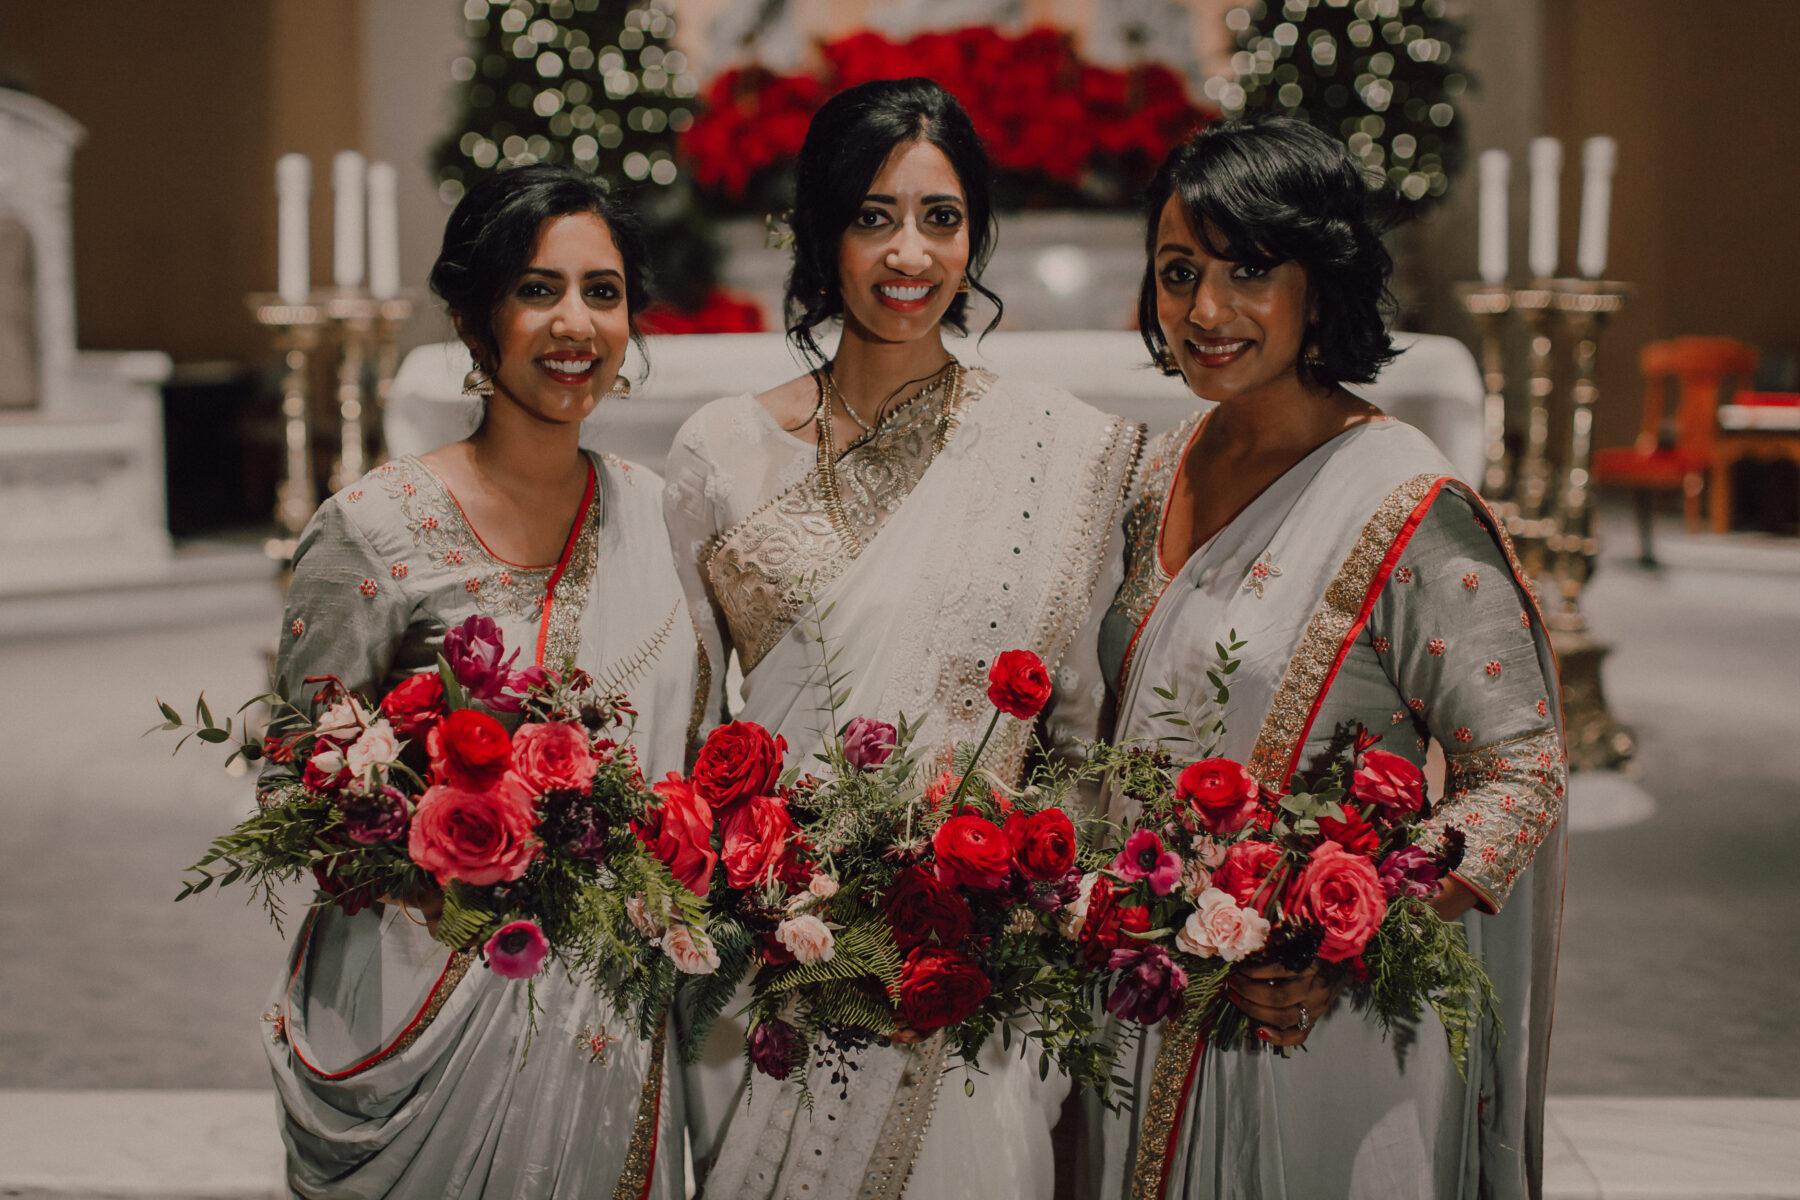 Red winter wedding bouquets   Nashville Bride Guide